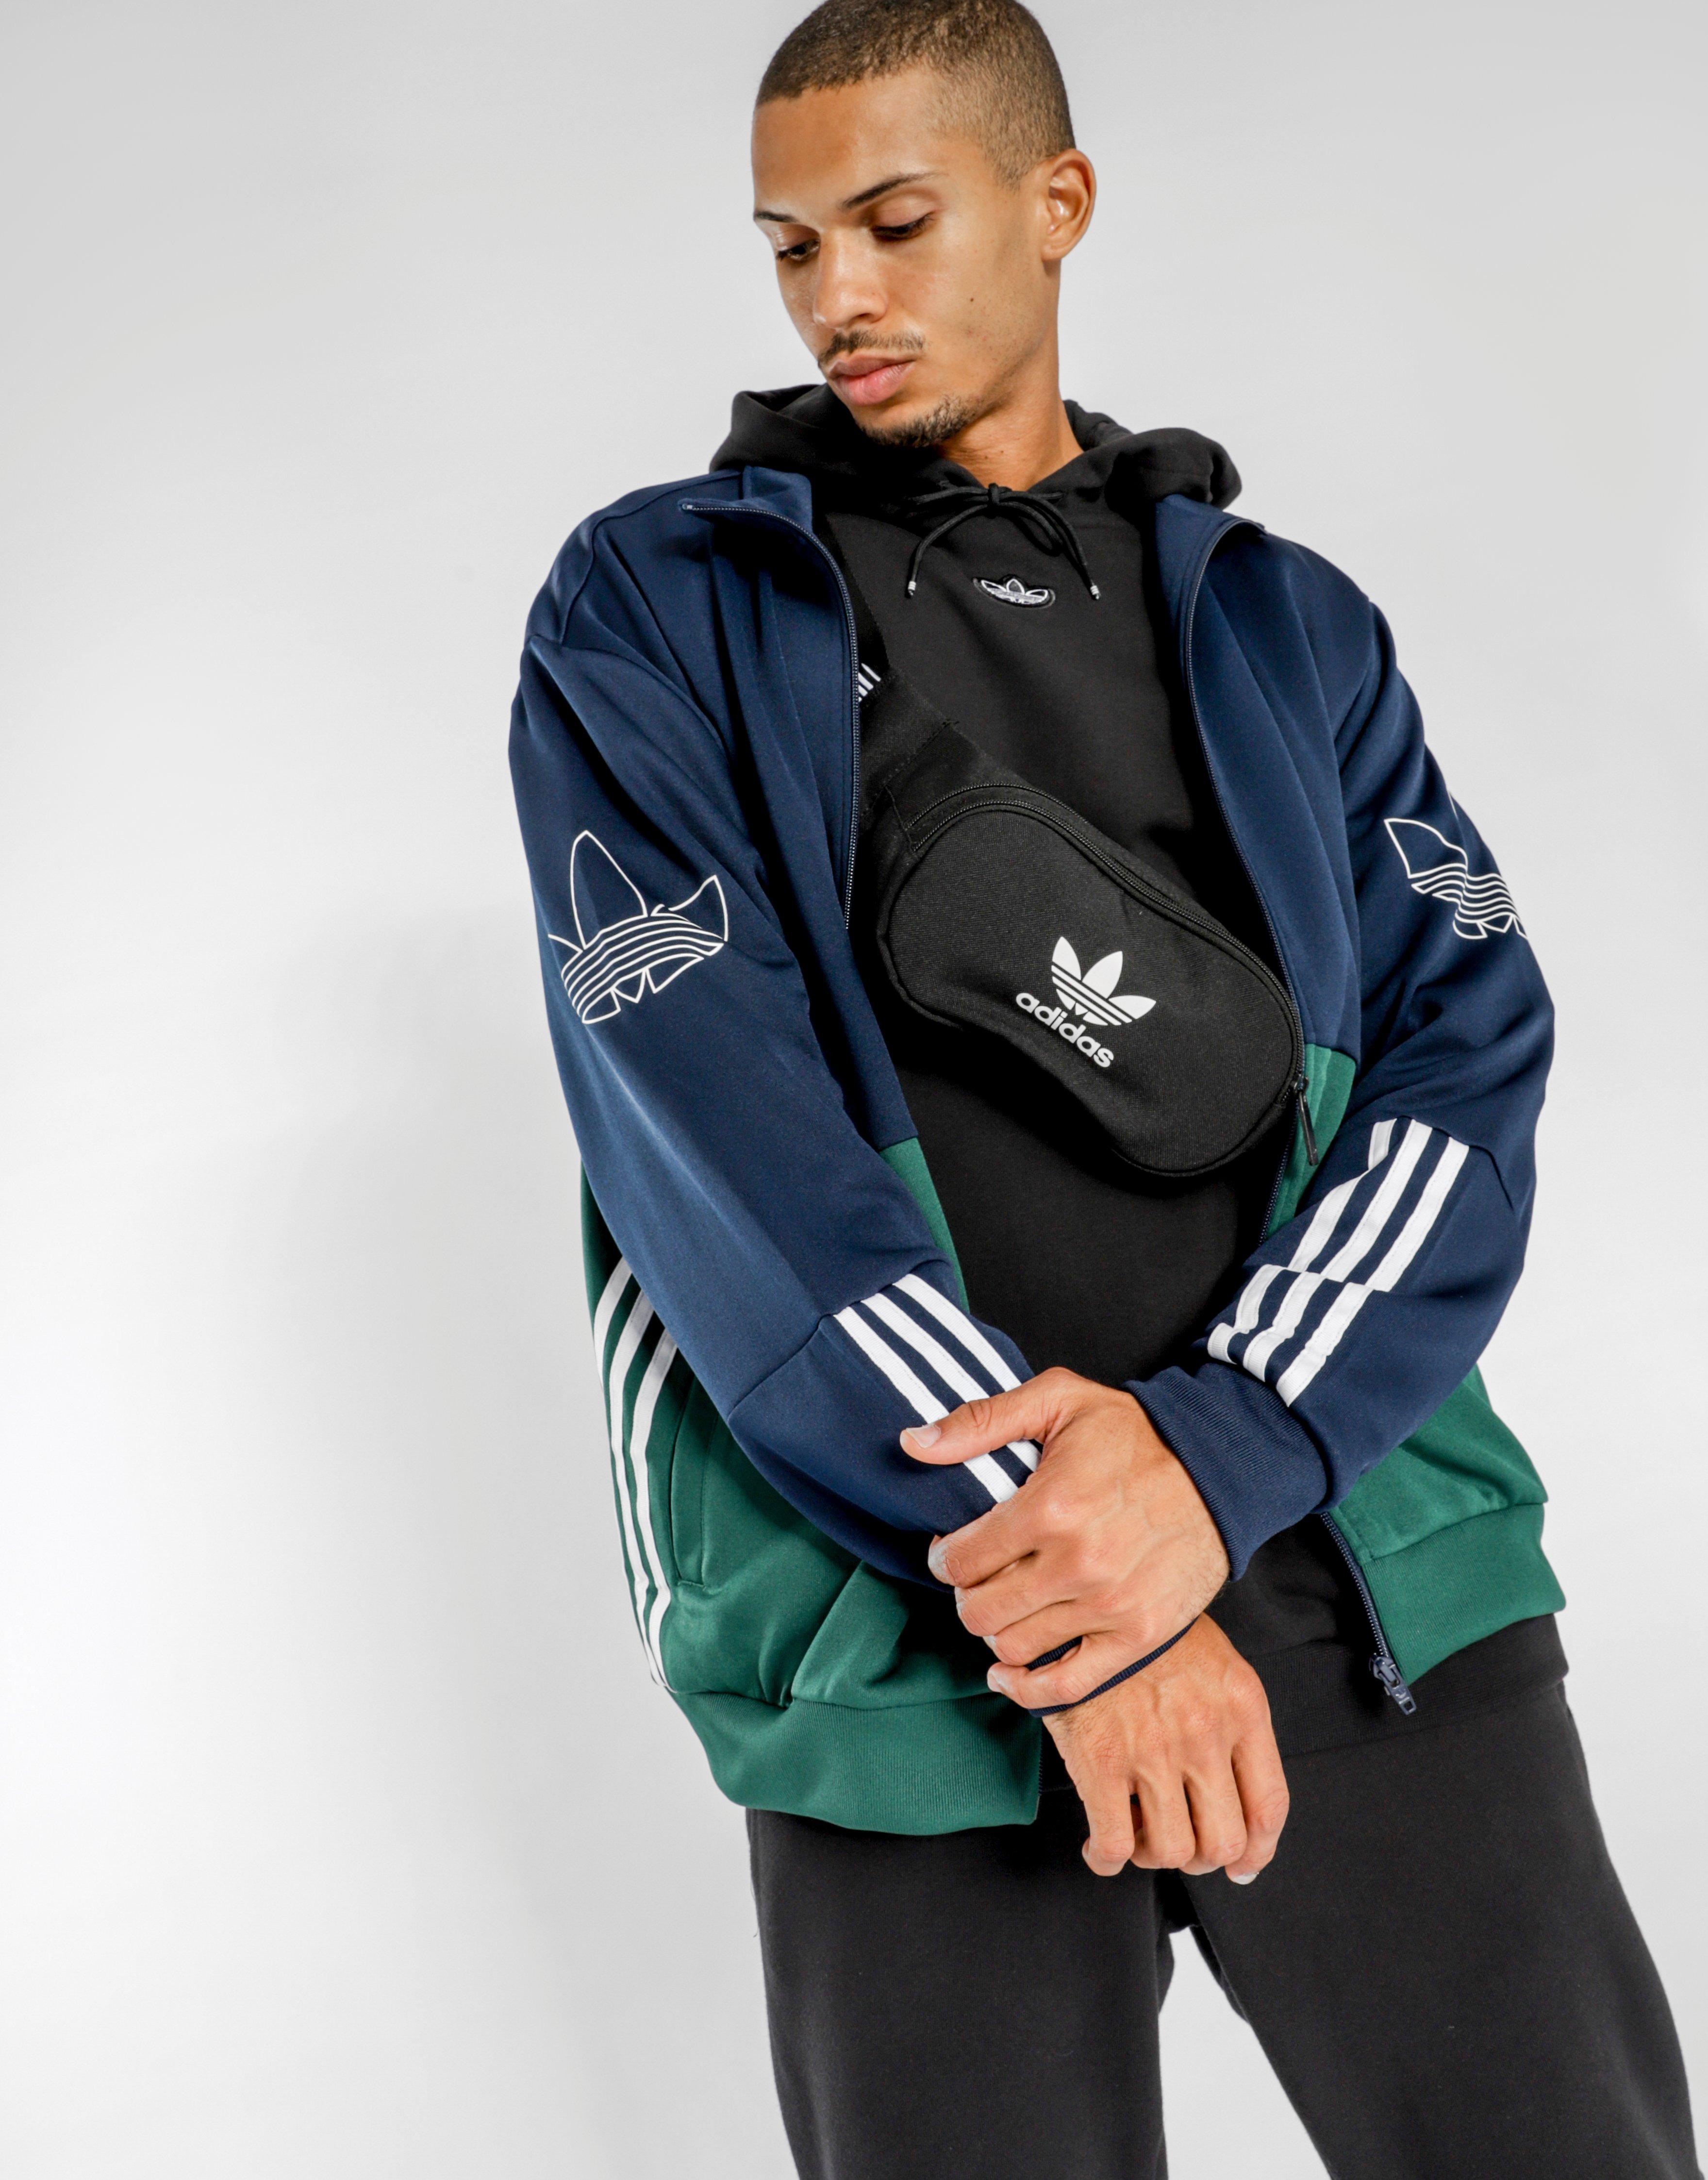 adidas originals retro jacket,adidas football predator